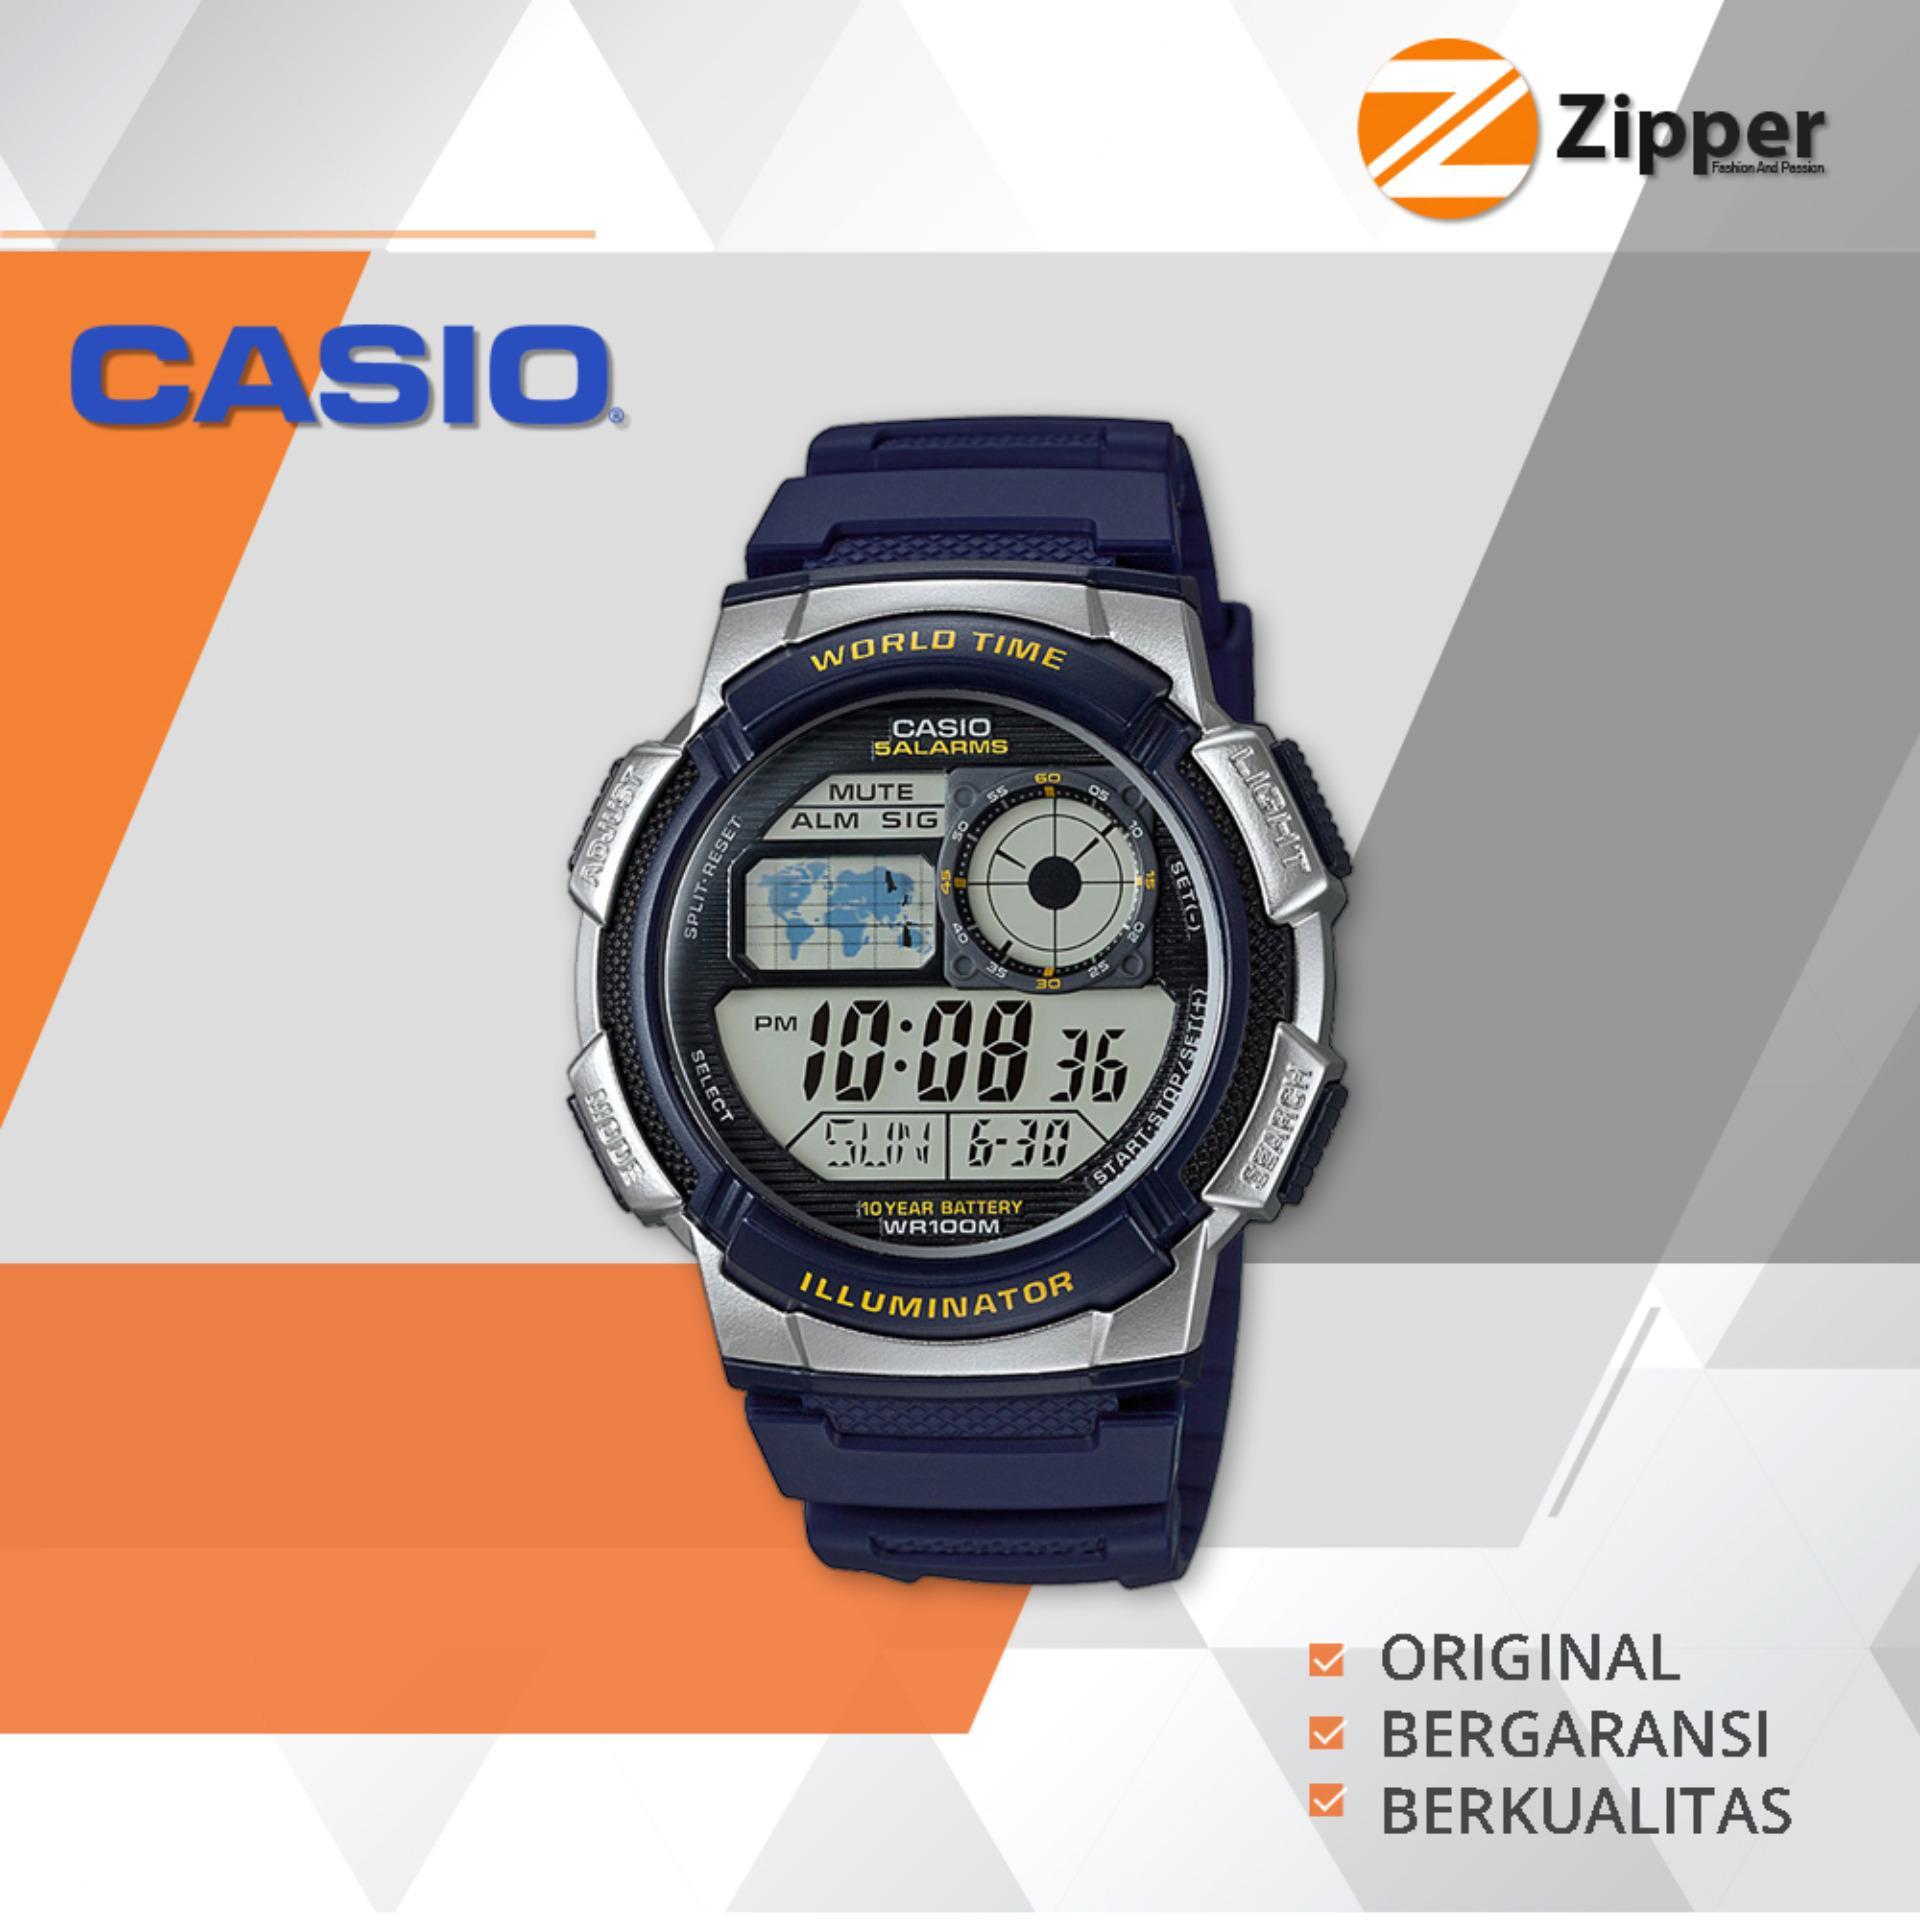 Beli Casio Illuminator Jam Tangan Digital Ae 1000W 2Avdf Youth Series Tali Karet Seken